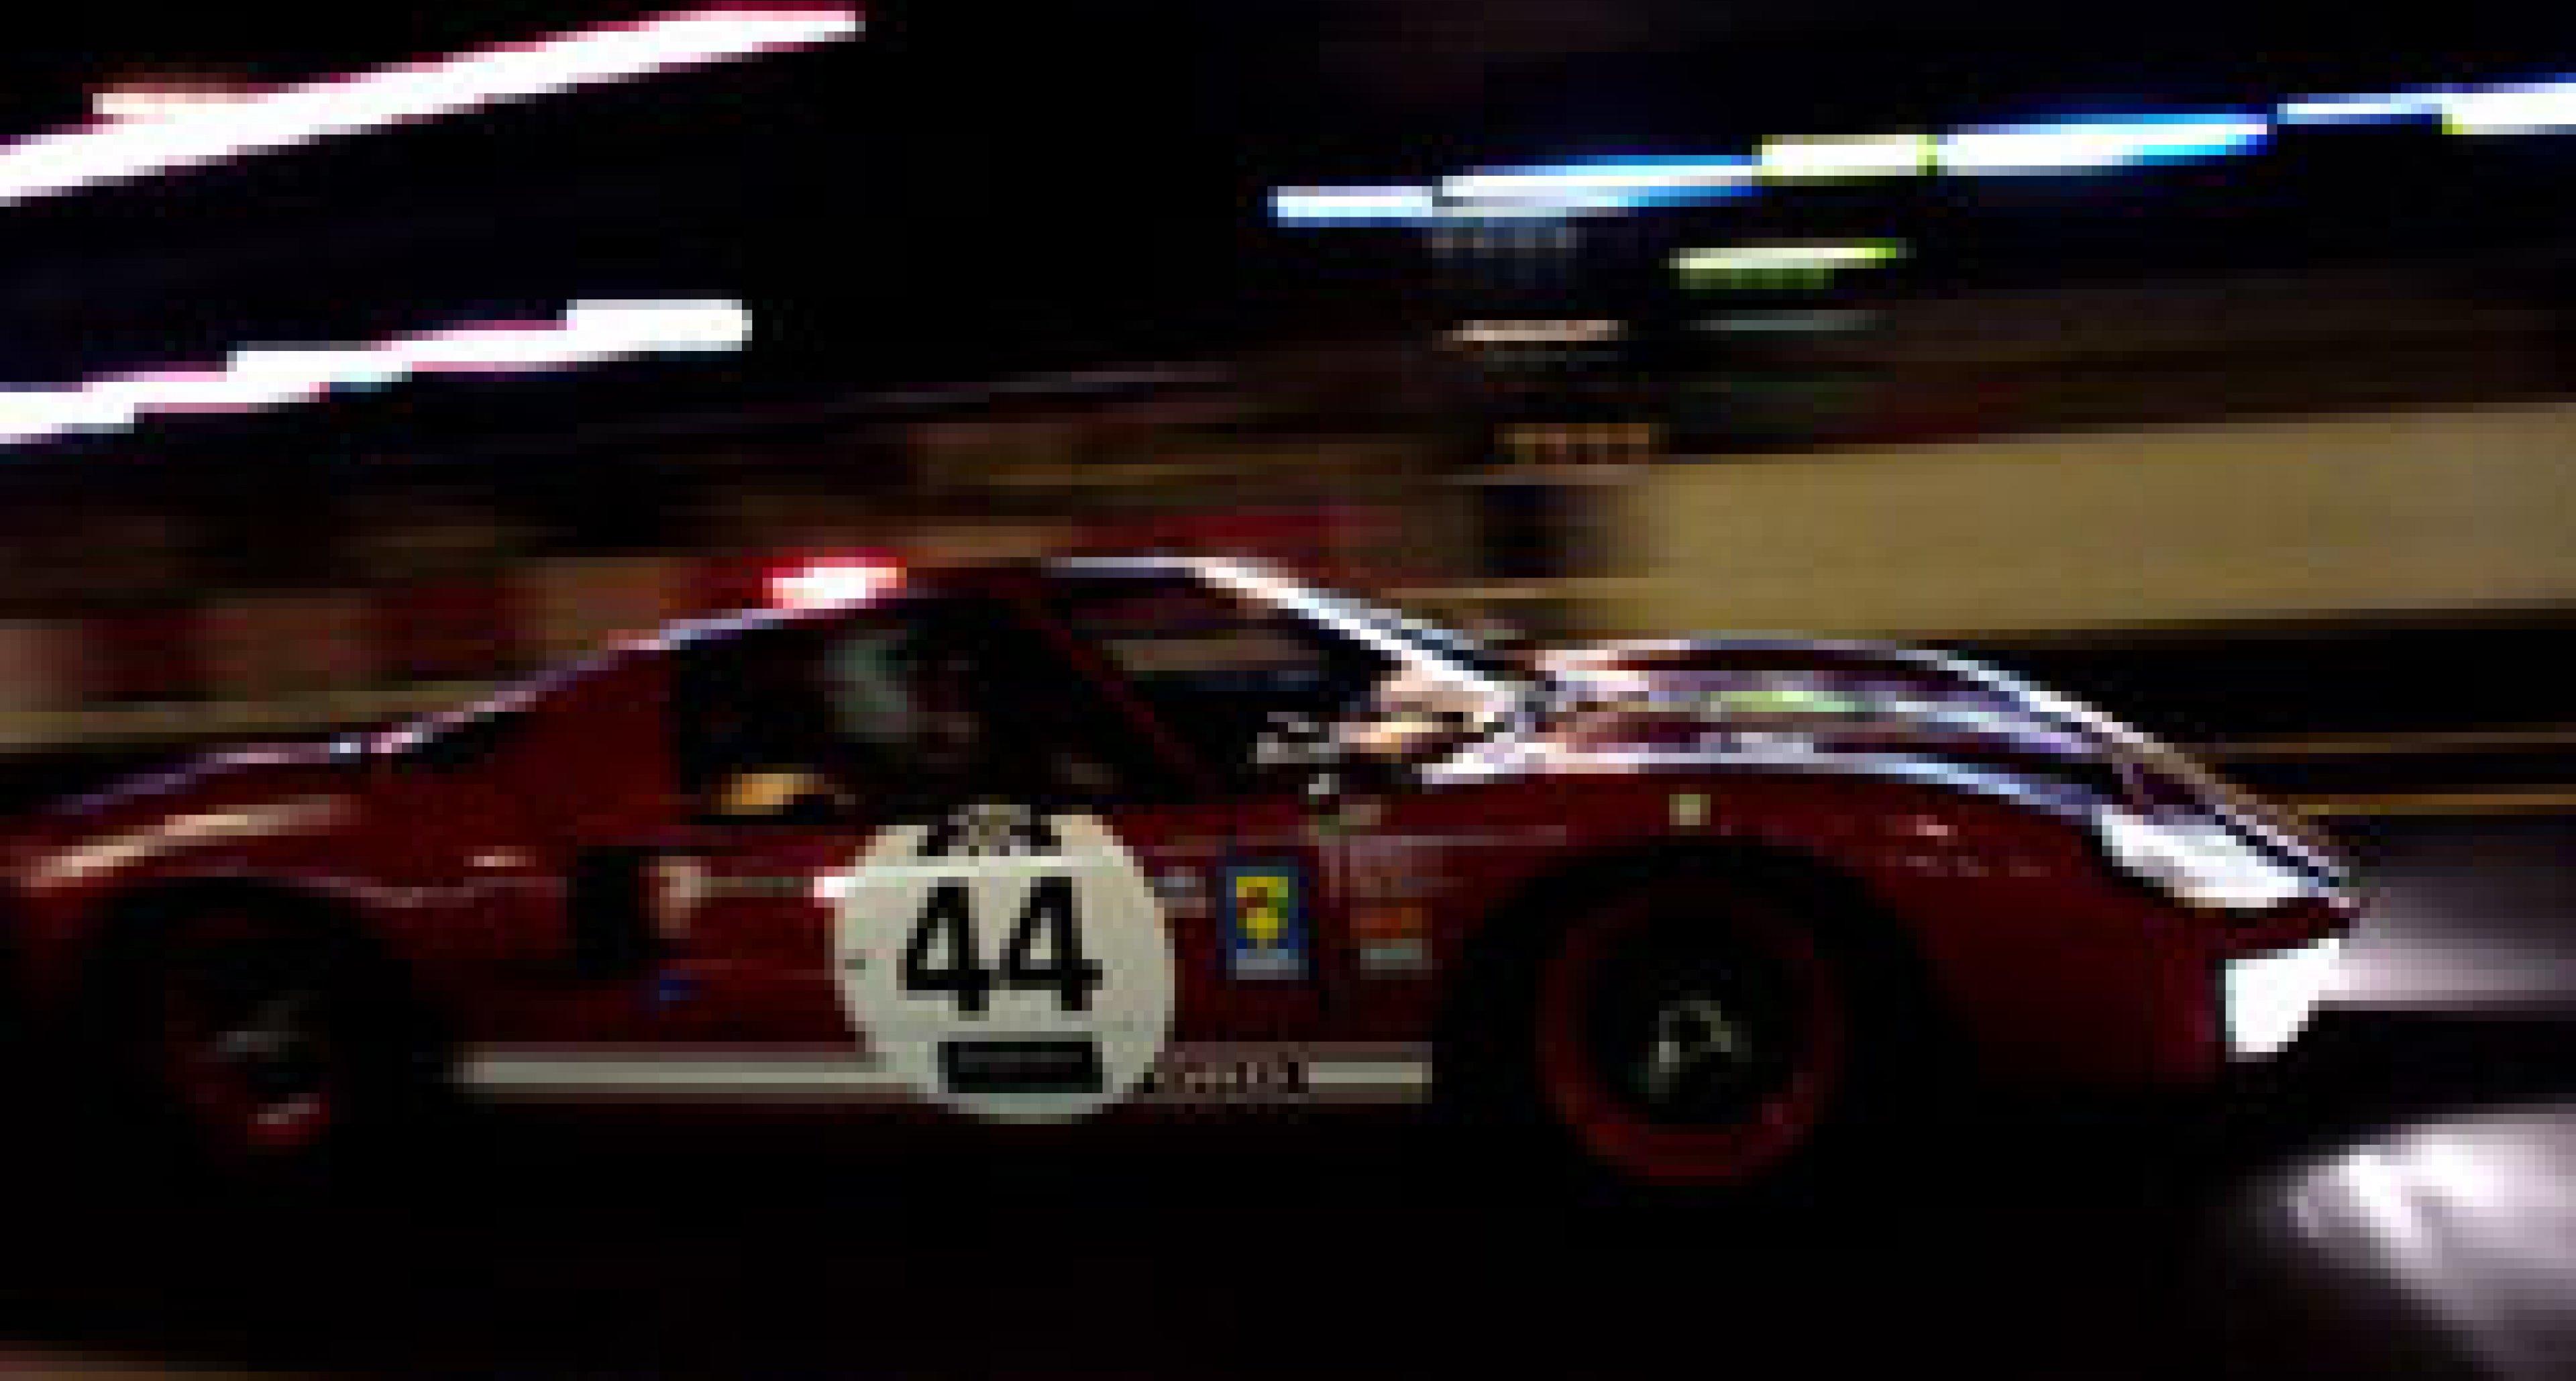 Immer am Limit – Von der Le Mans Classic 2002